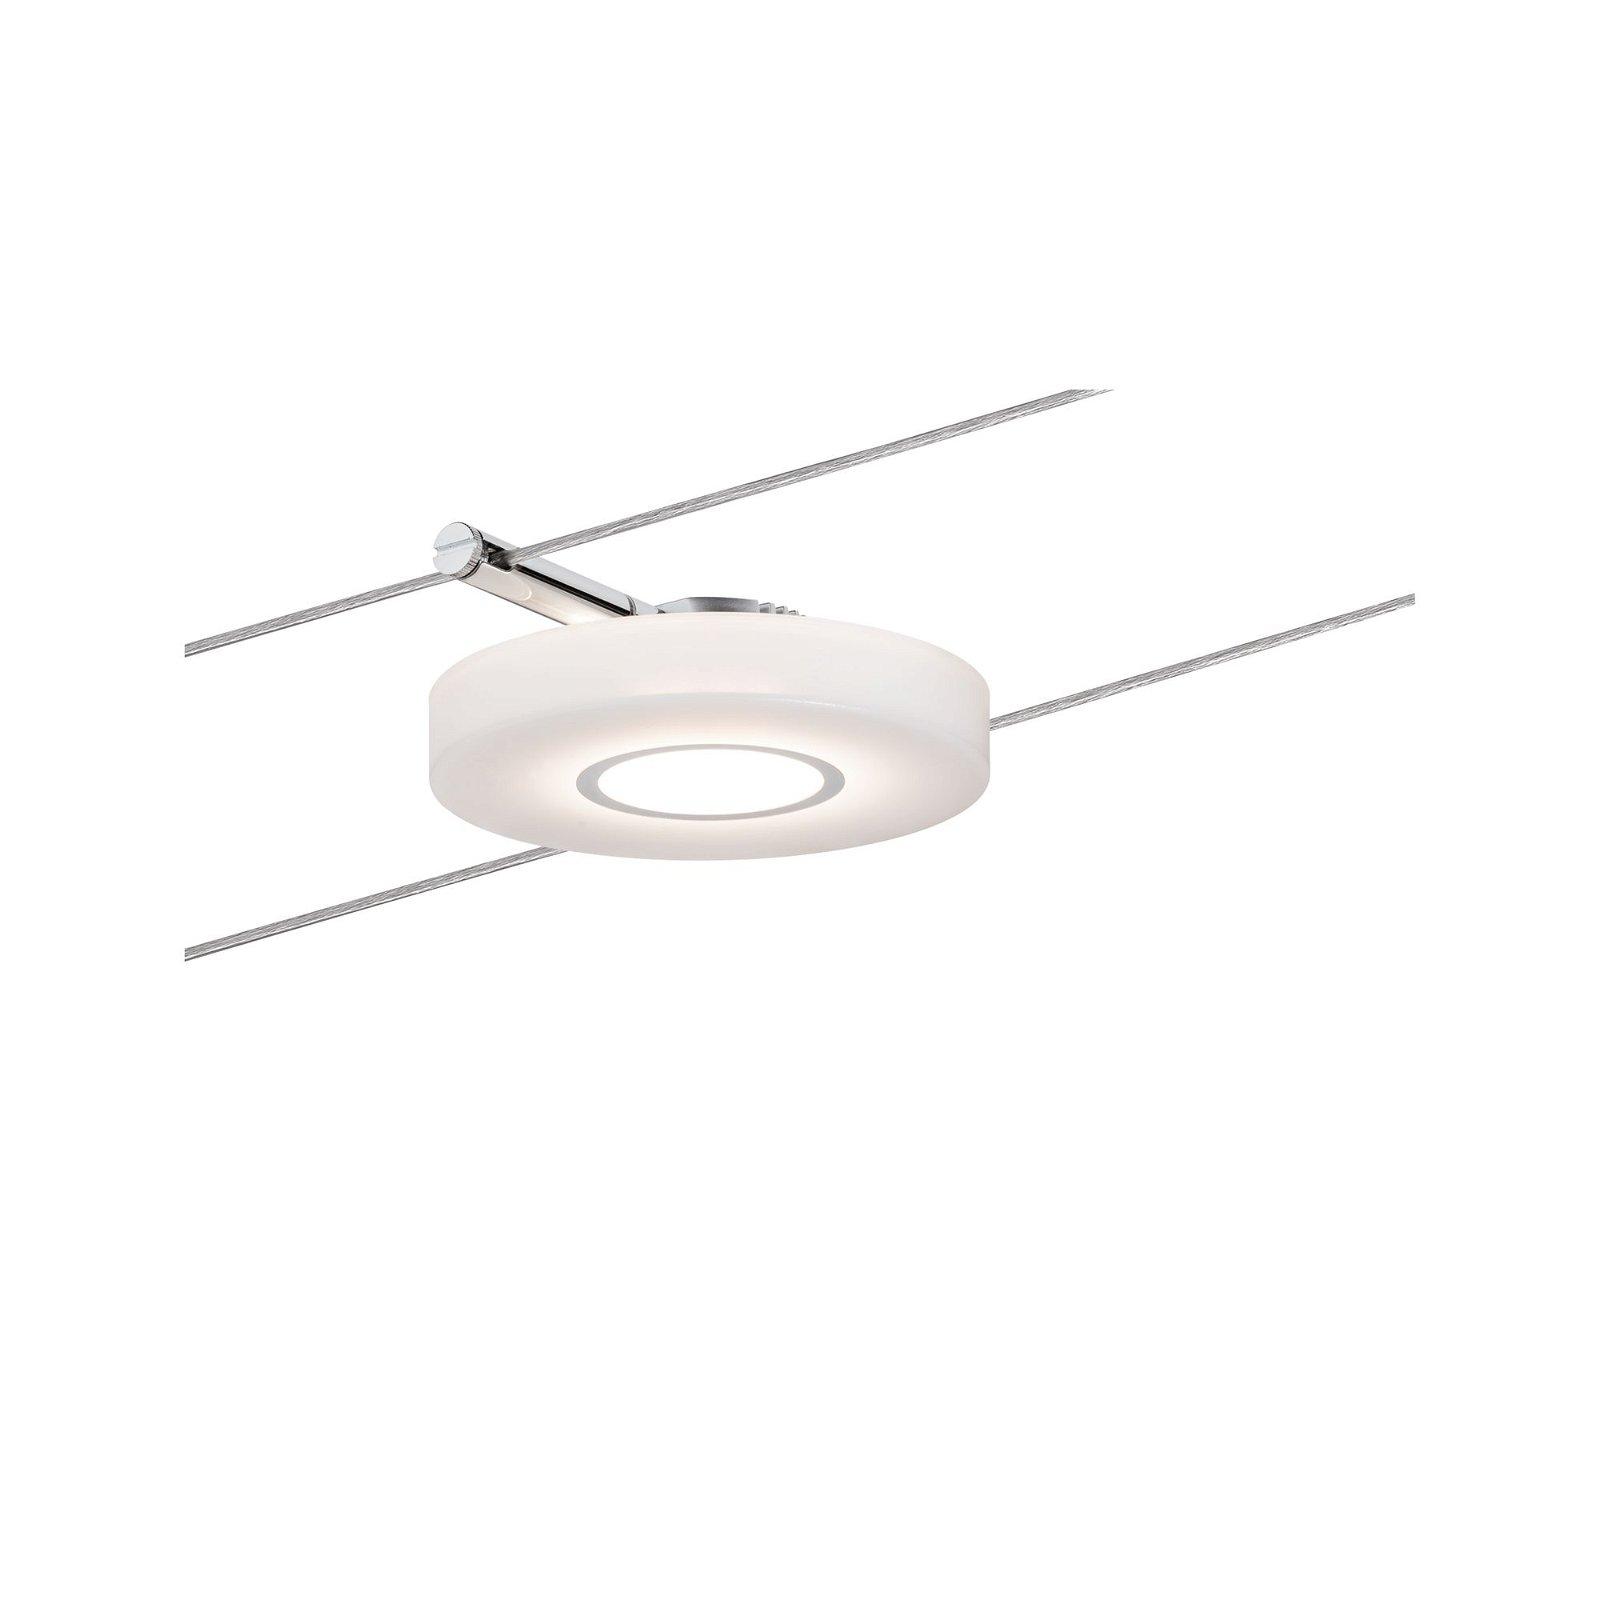 LED Seilsystem DiscLED I Einzelspot 200lm 4W 2700K 230/12V Chrom/Satin